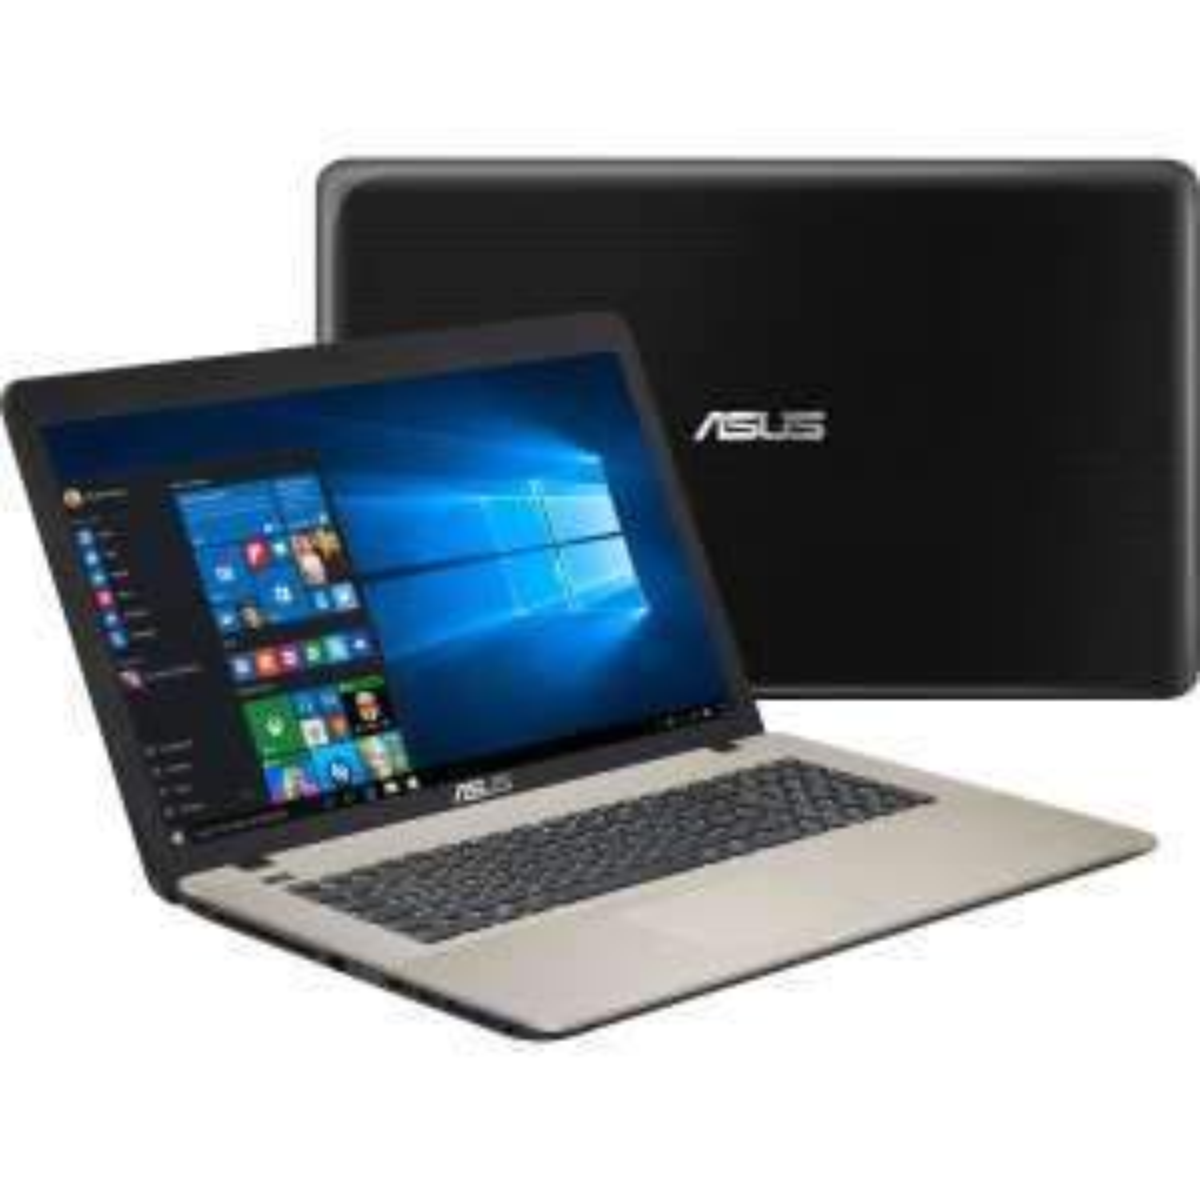 "PC Portable 17,3"" Asus K751LJ-TY367T - i5-5200U, 4 Go de RAM, 1 To"